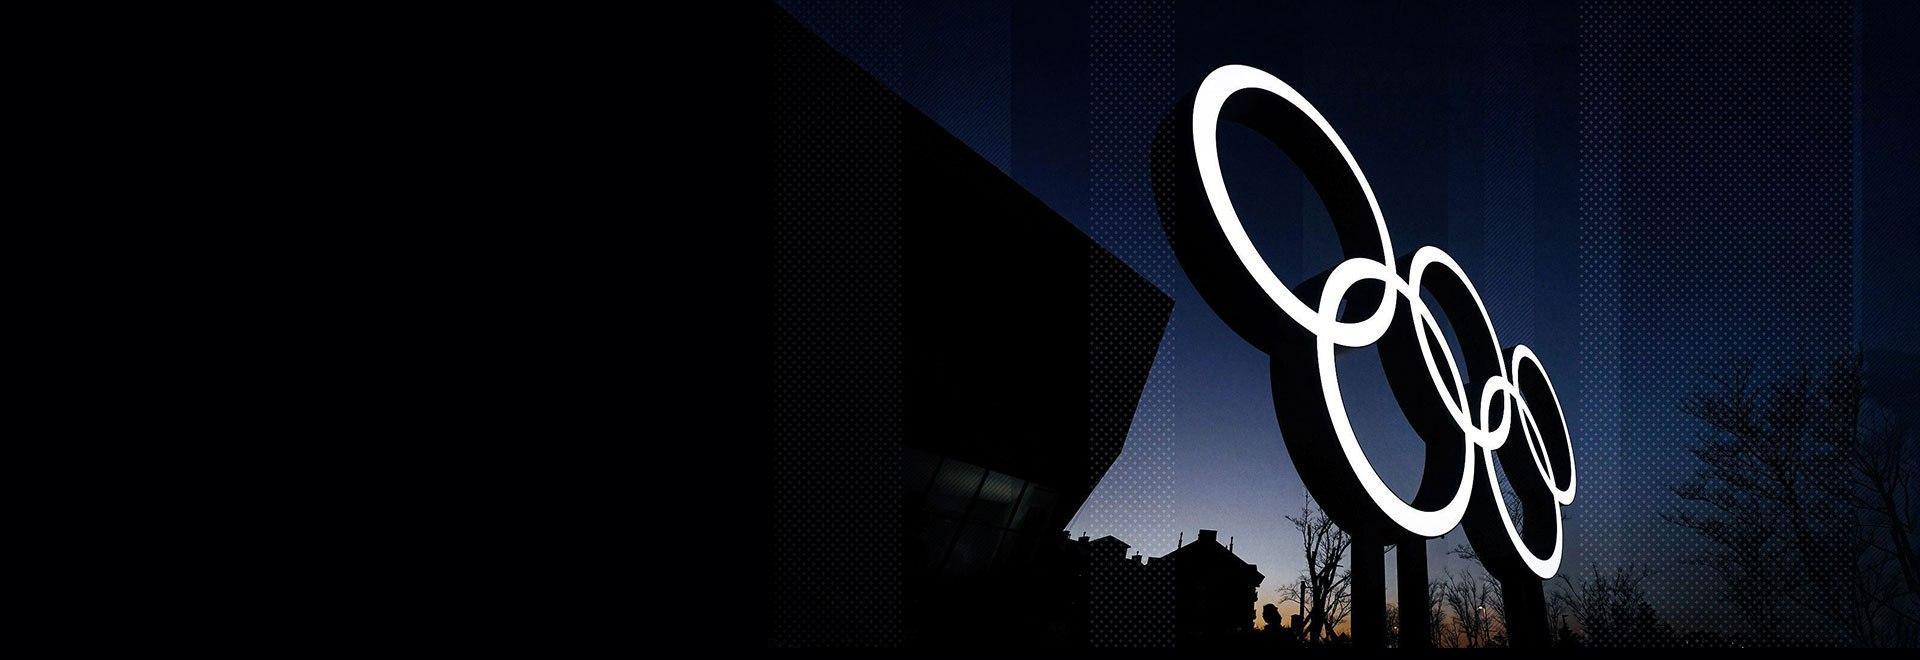 Hall of Fame Londra 2012 - Basket: USA - Spagna